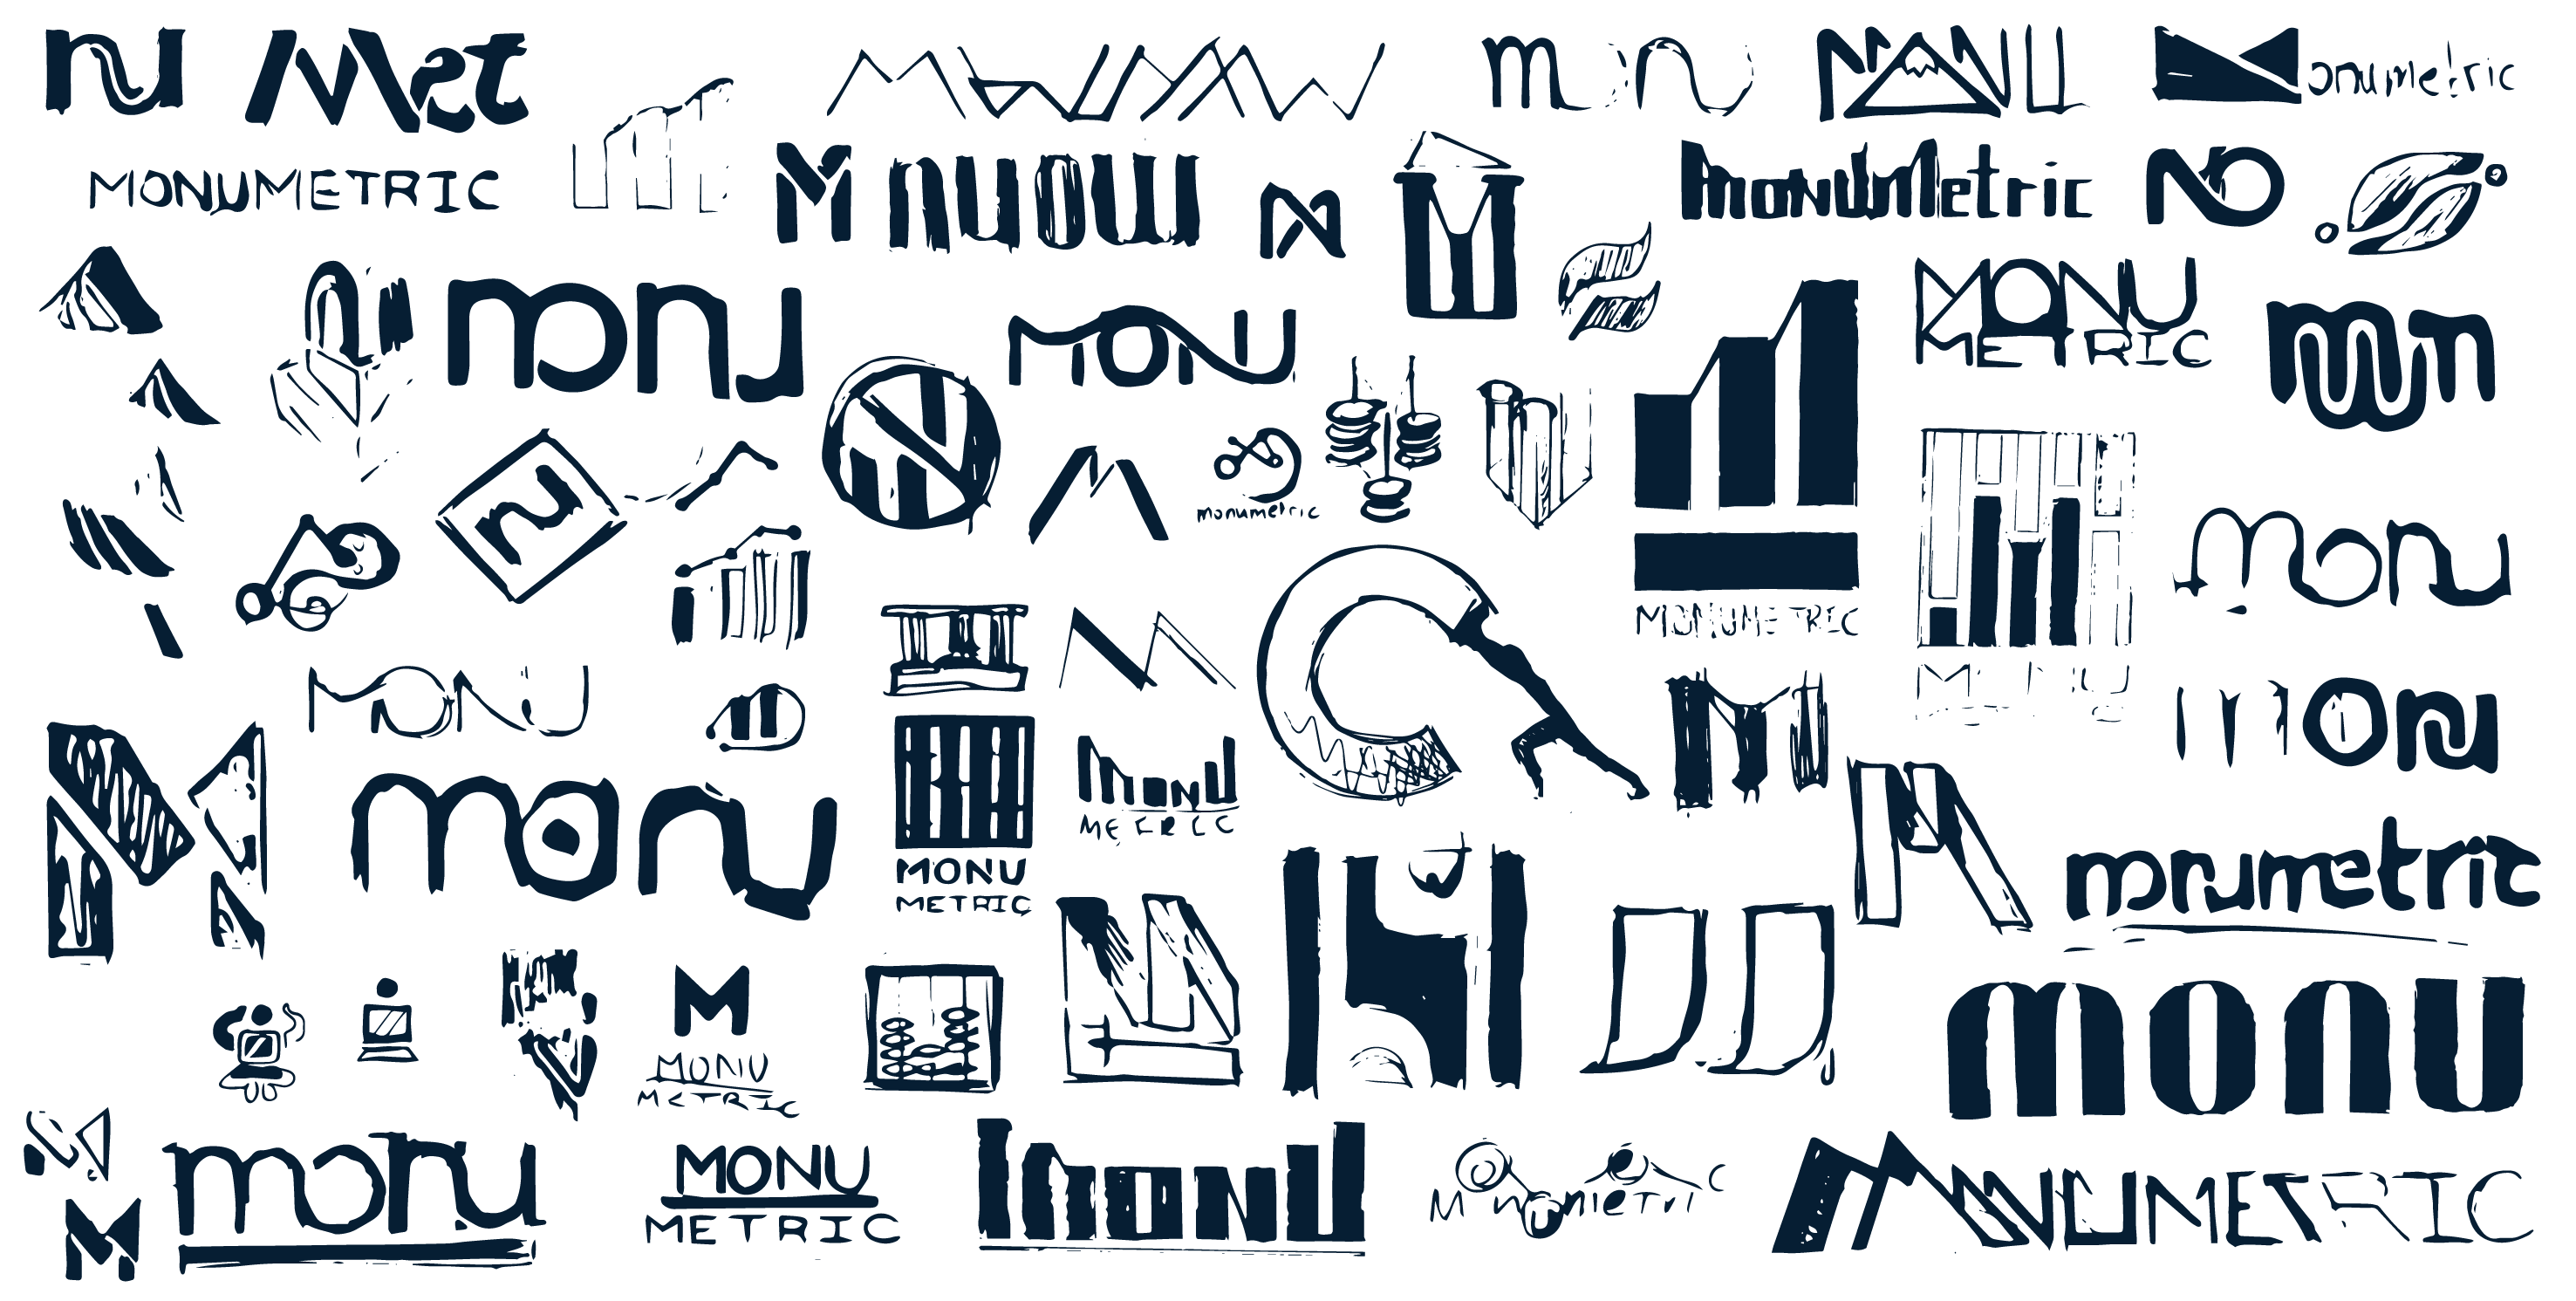 Monumetric Monumetric Monumetric Sketches